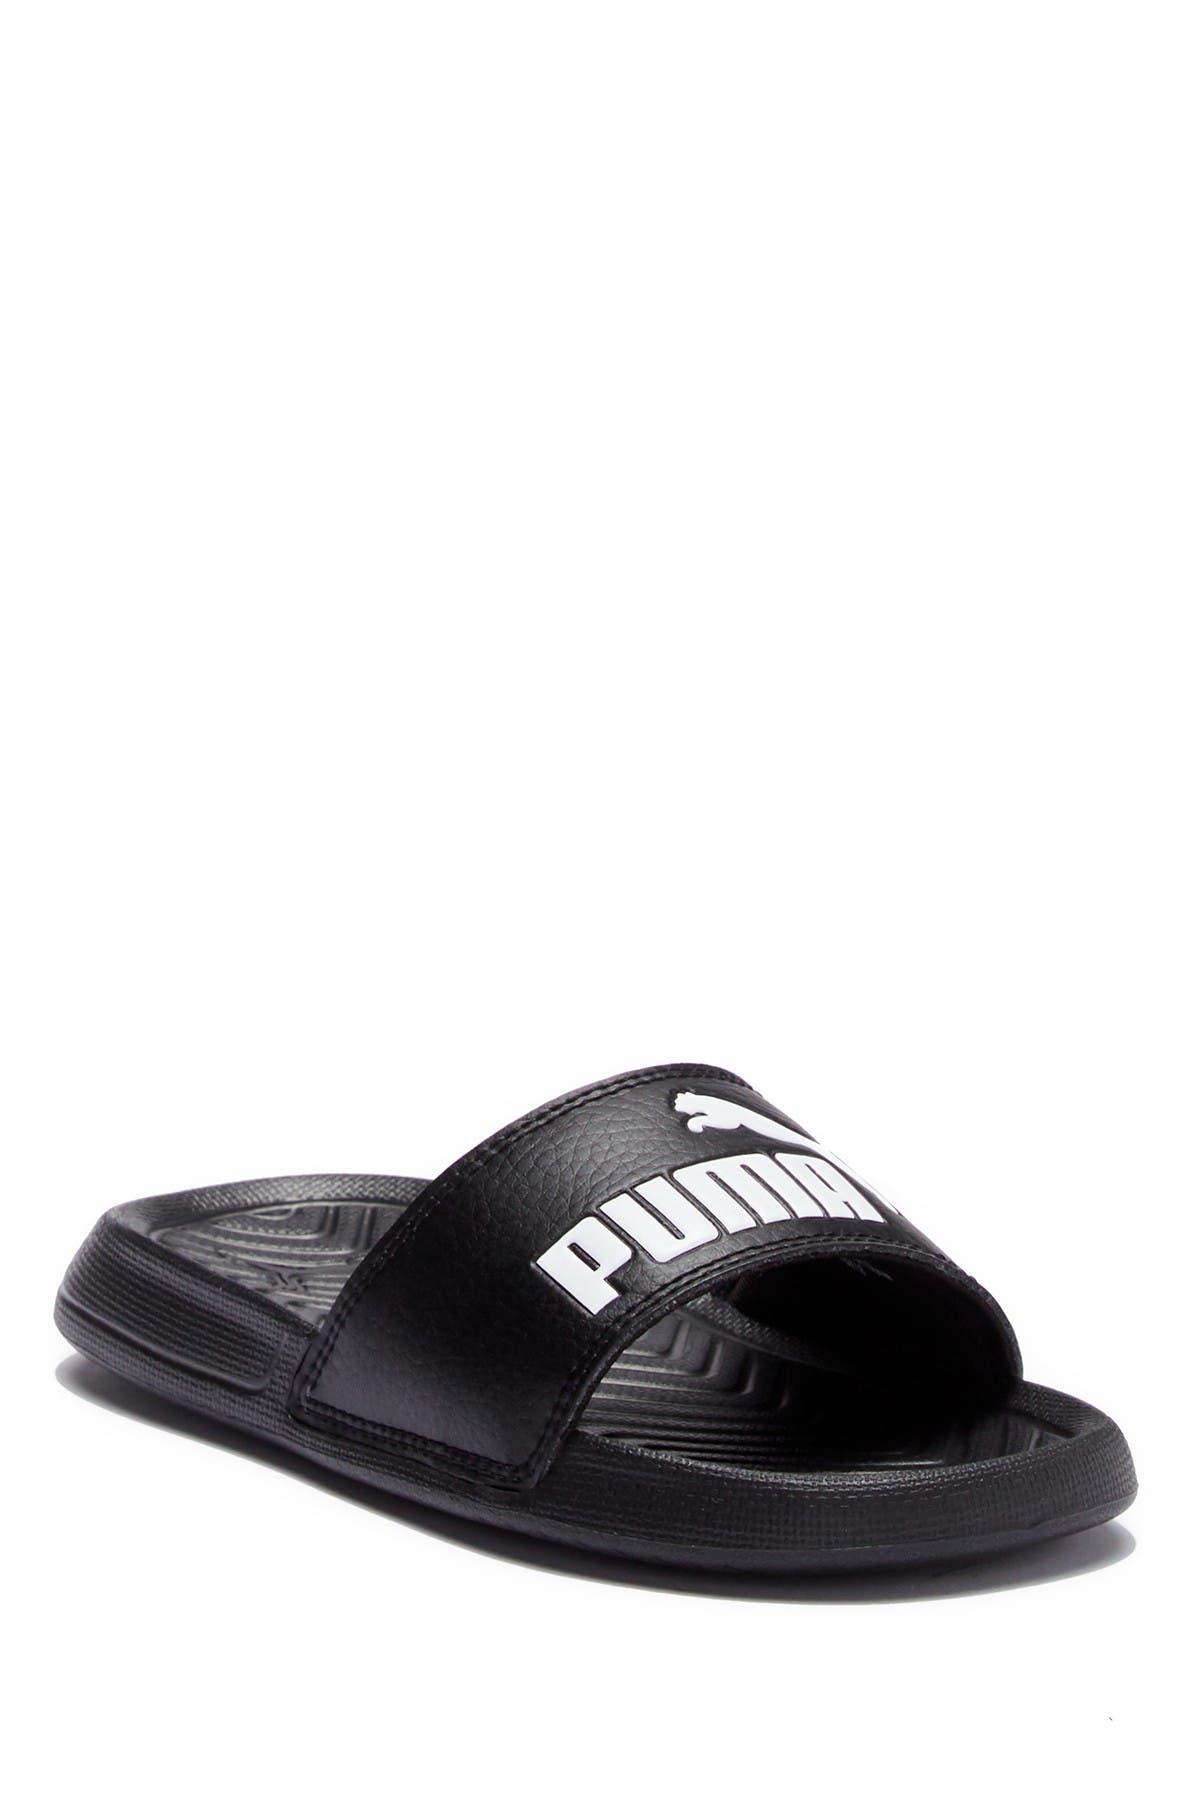 Image of PUMA Popcat PS Slide Sandal